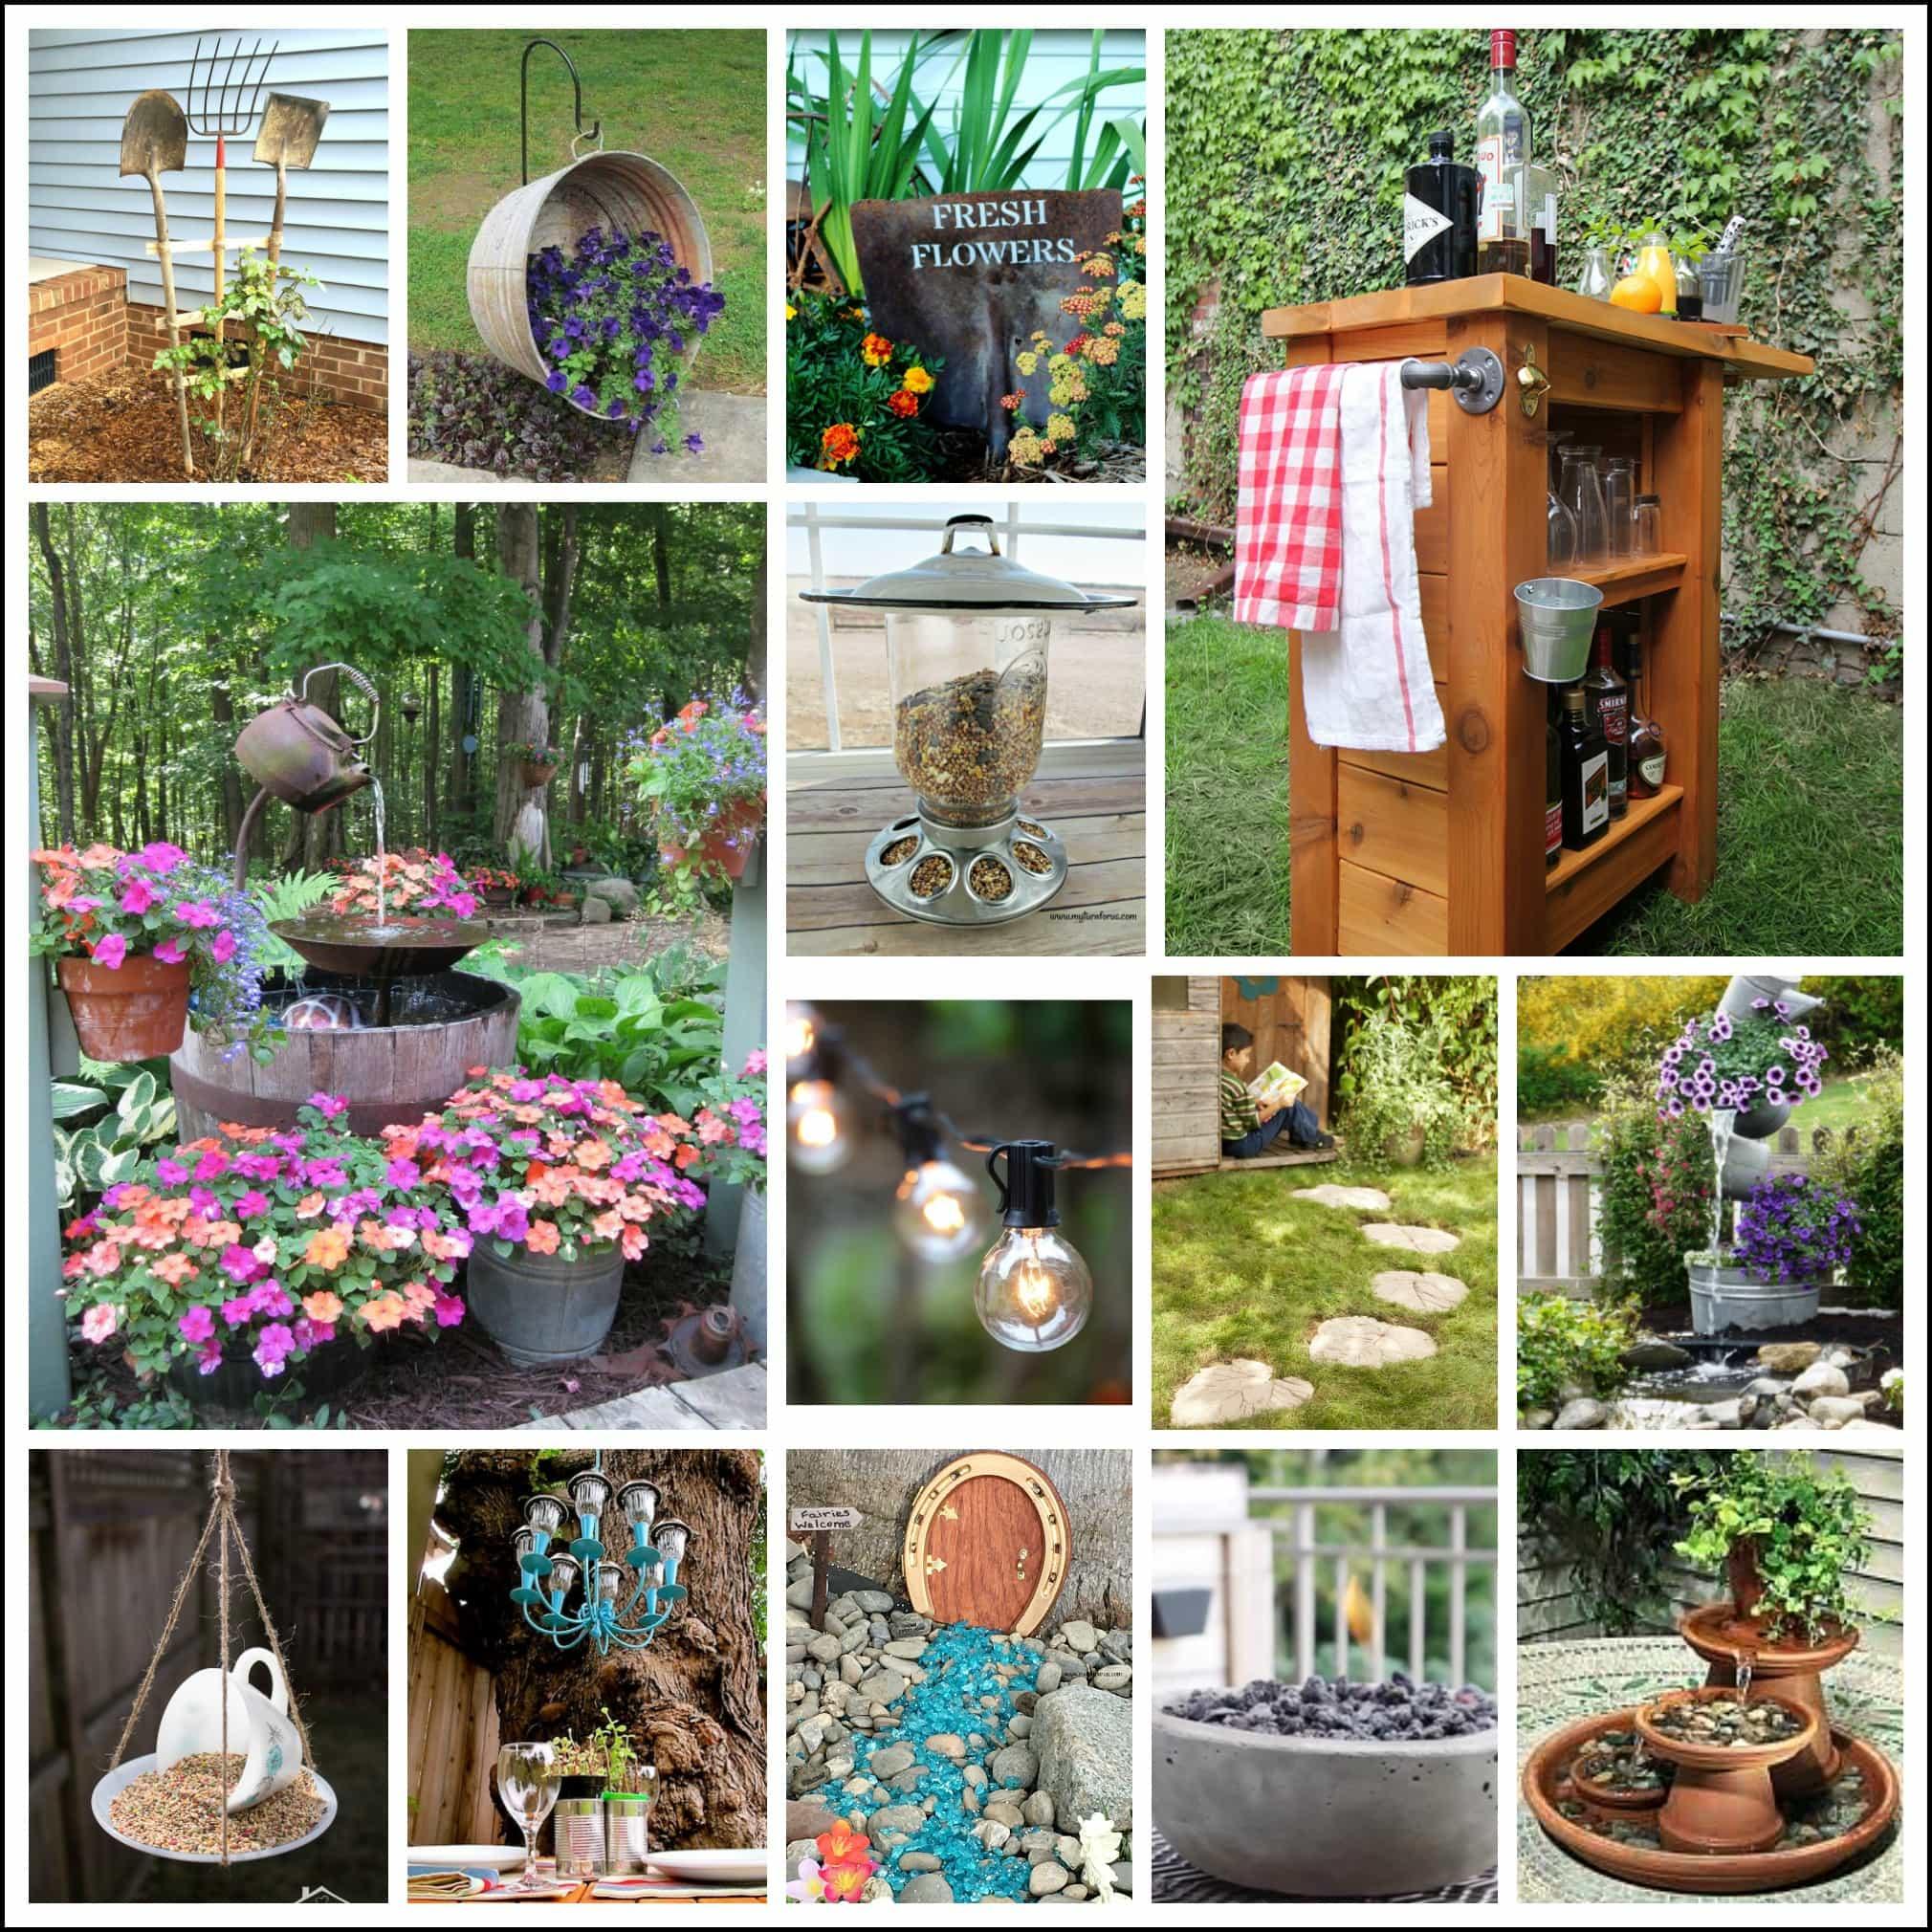 23 Best DIY Backyard Projects and Garden Ideas - My Turn ... on Diy Back Patio Ideas id=93833